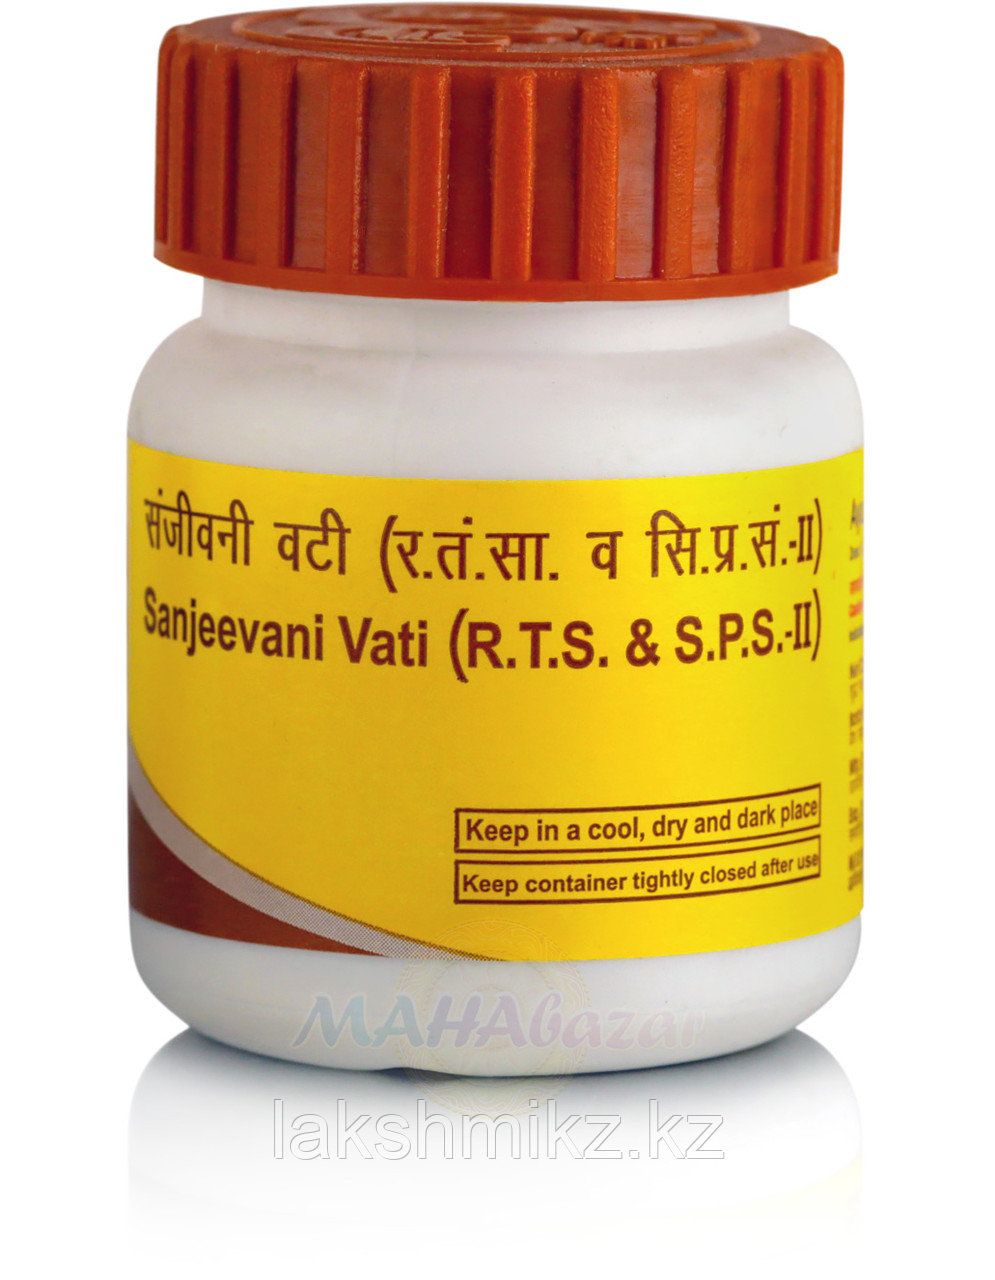 Сандживани Вати/Sanjivani Vati